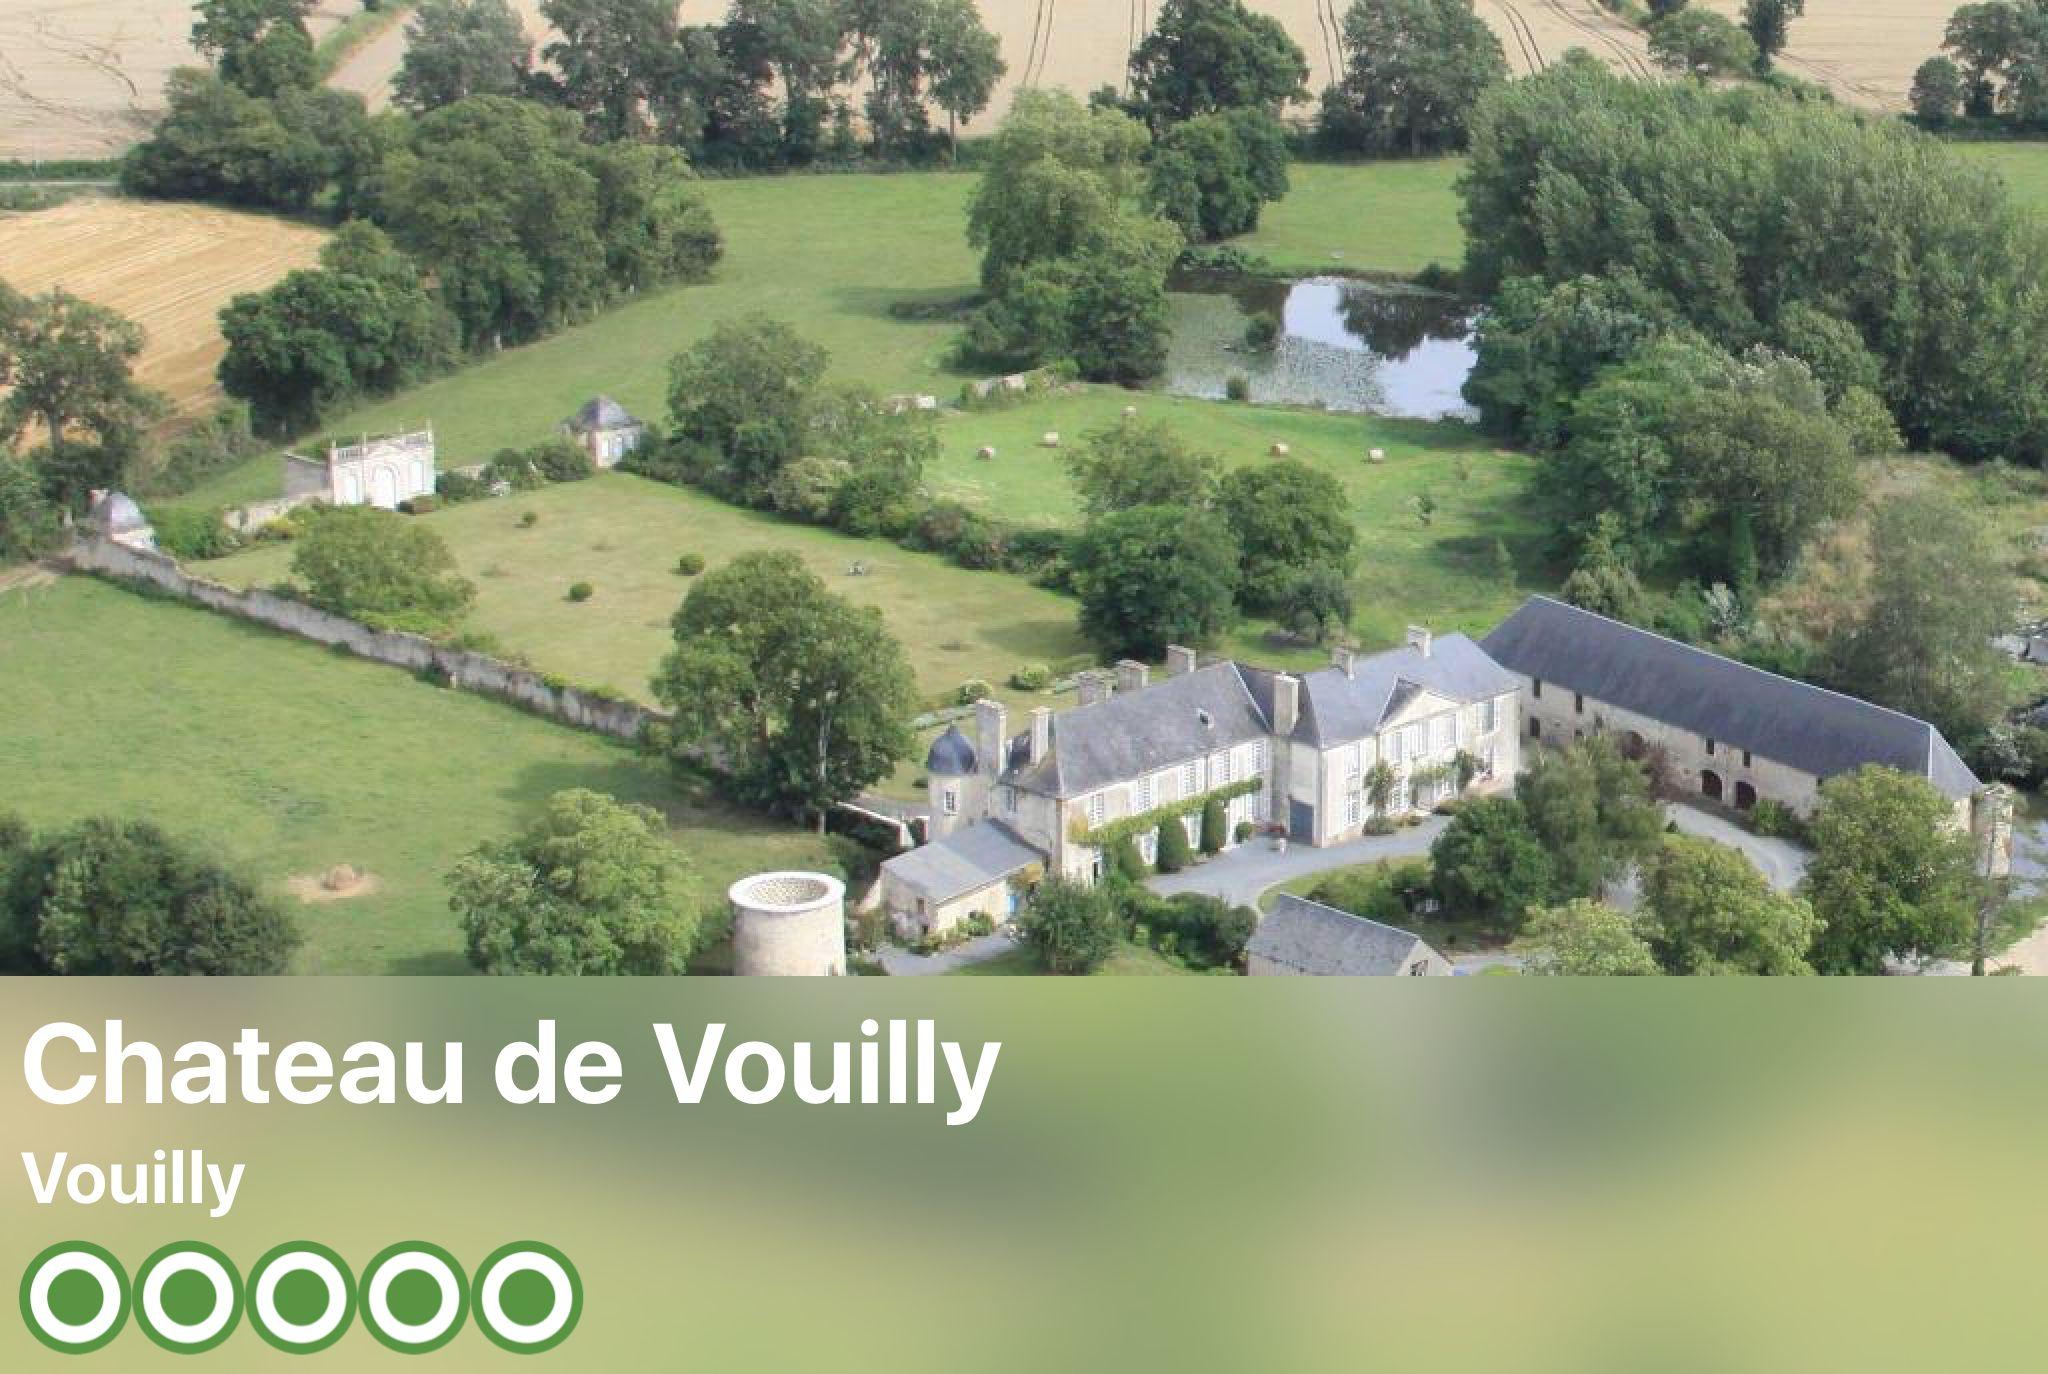 https://www.tripadvisor.com/Hotel_Review-g1231375-d606466-Reviews-Chateau_de_Vouilly-Vouilly_Calvados_Basse_Normandie_Normandy.html?m=19904